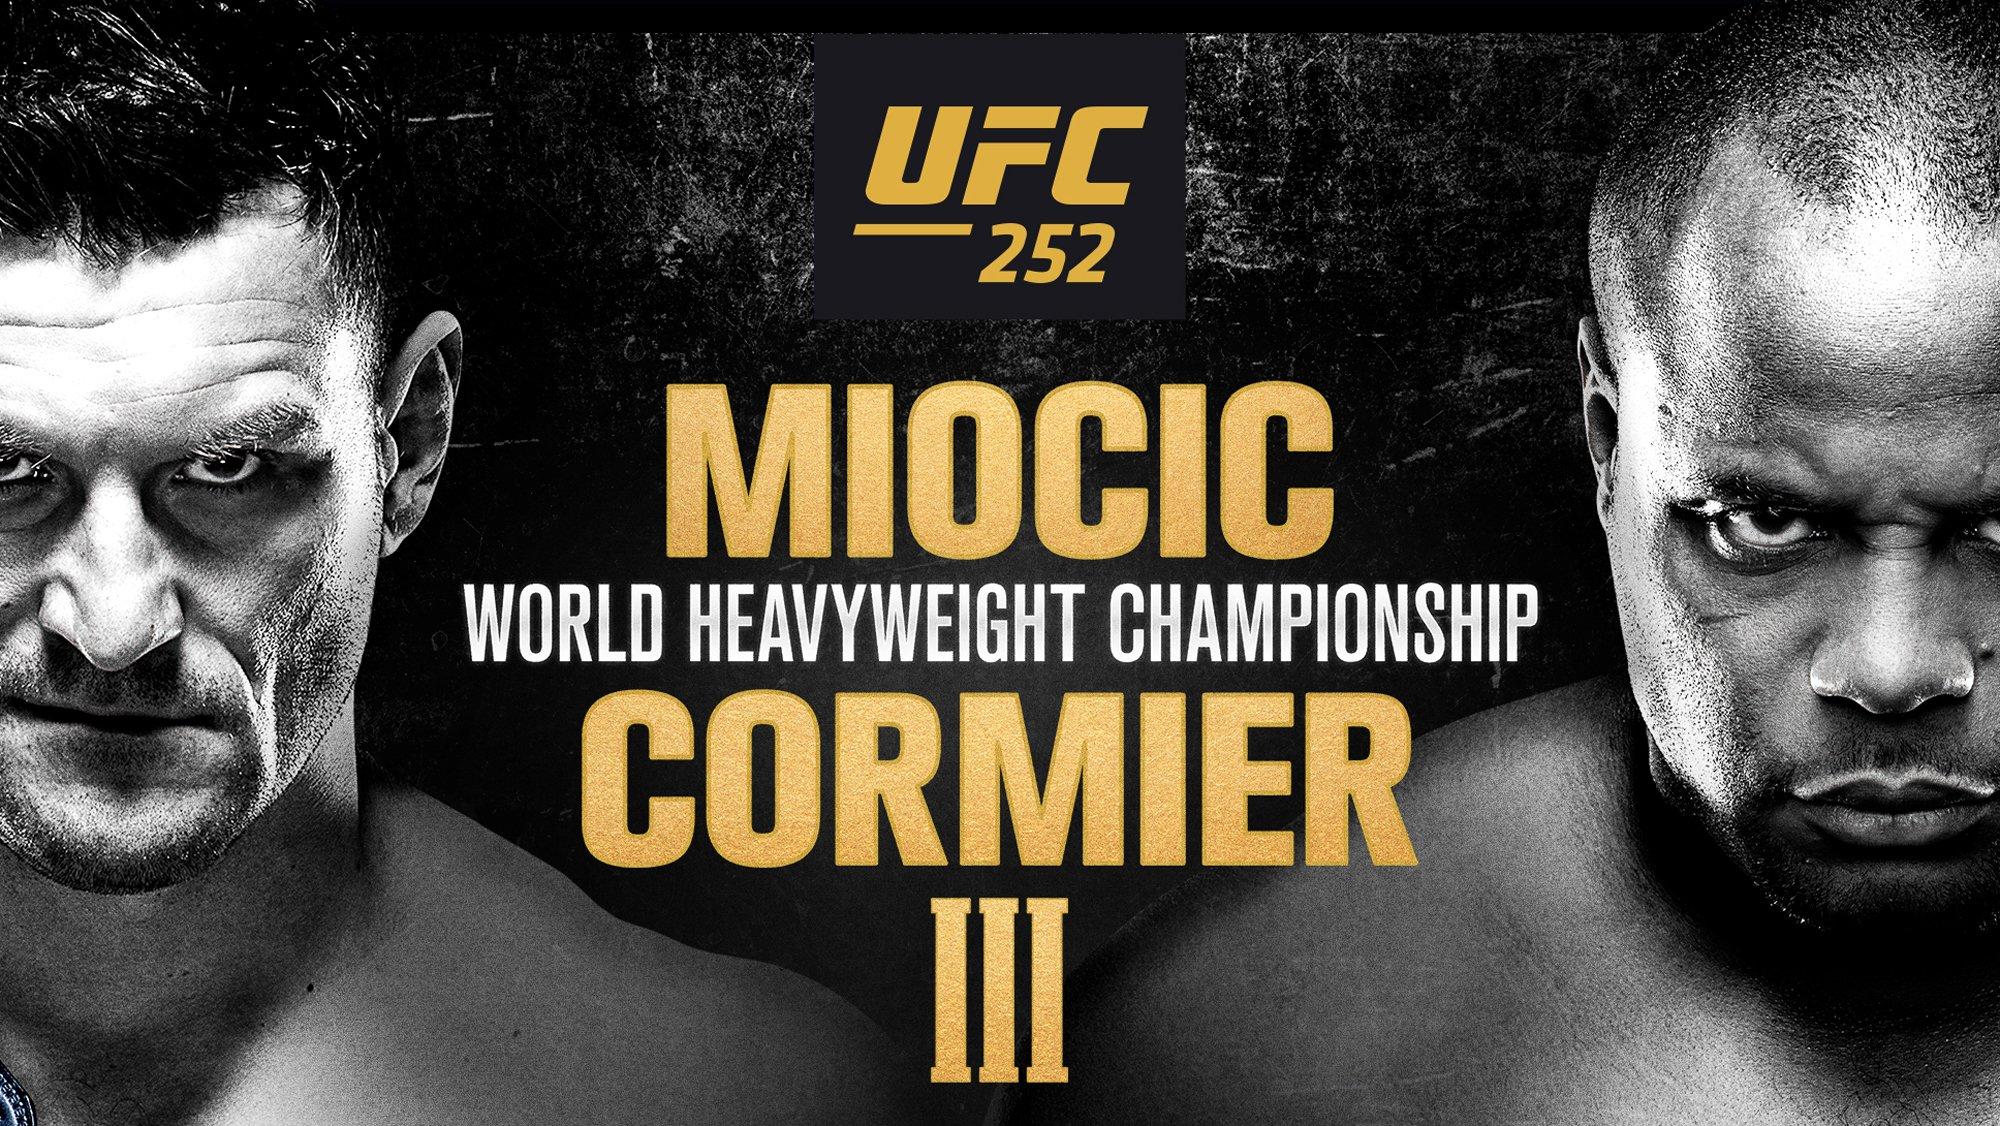 How to watch UFC 252: Miocic vs Cormier